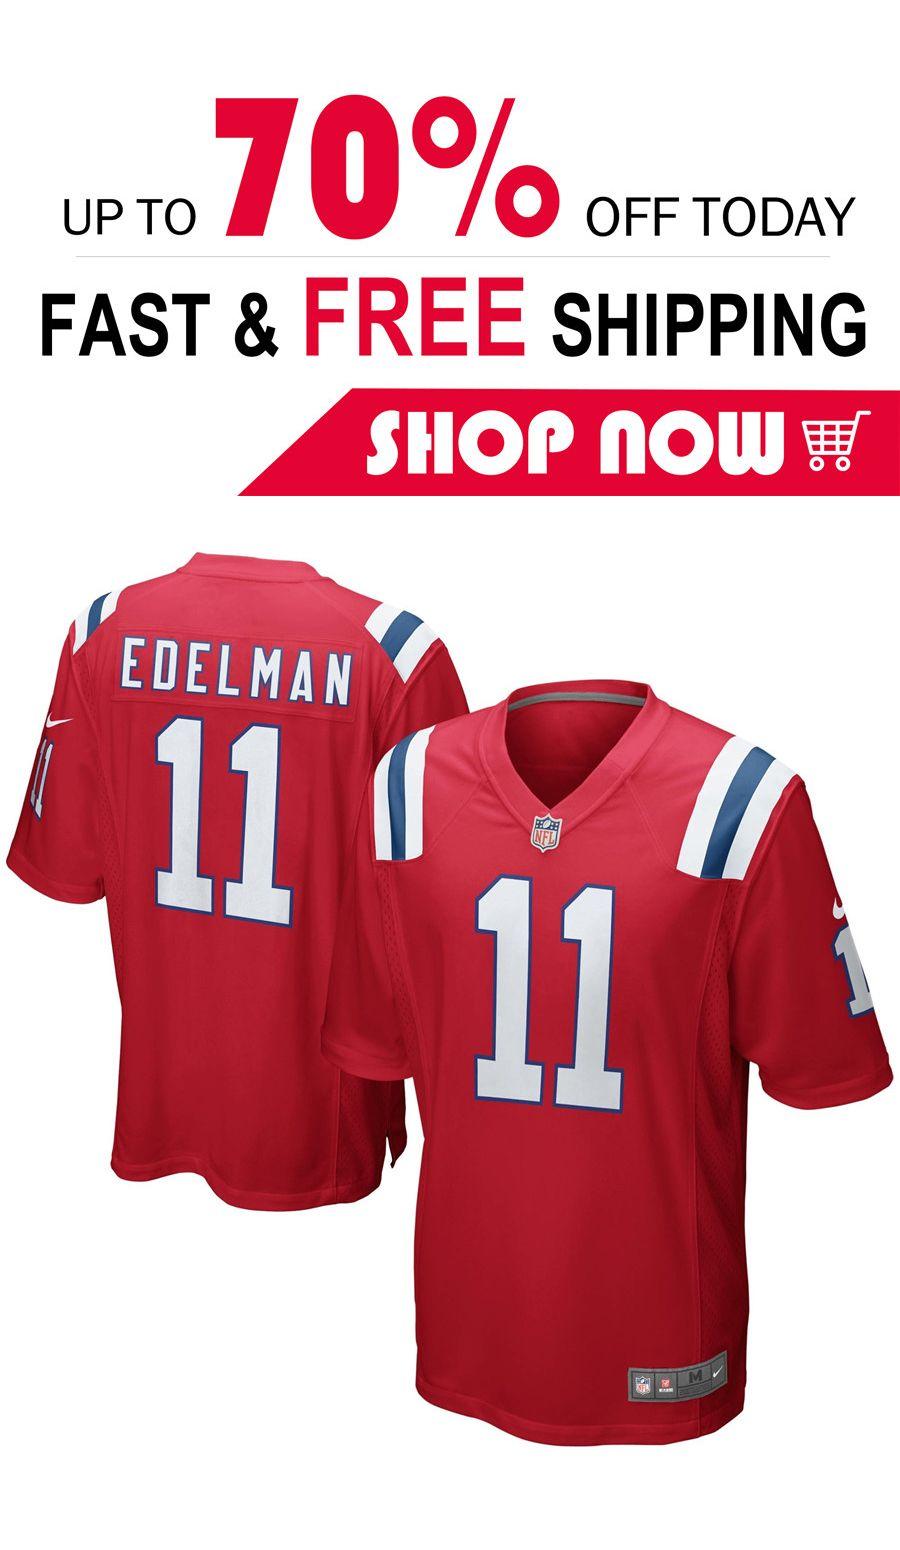 Julian Edelman New England Patriots Nfl Pro Line Team Color Jersey Red New England Patriots Football New England Patriots Patriots Football